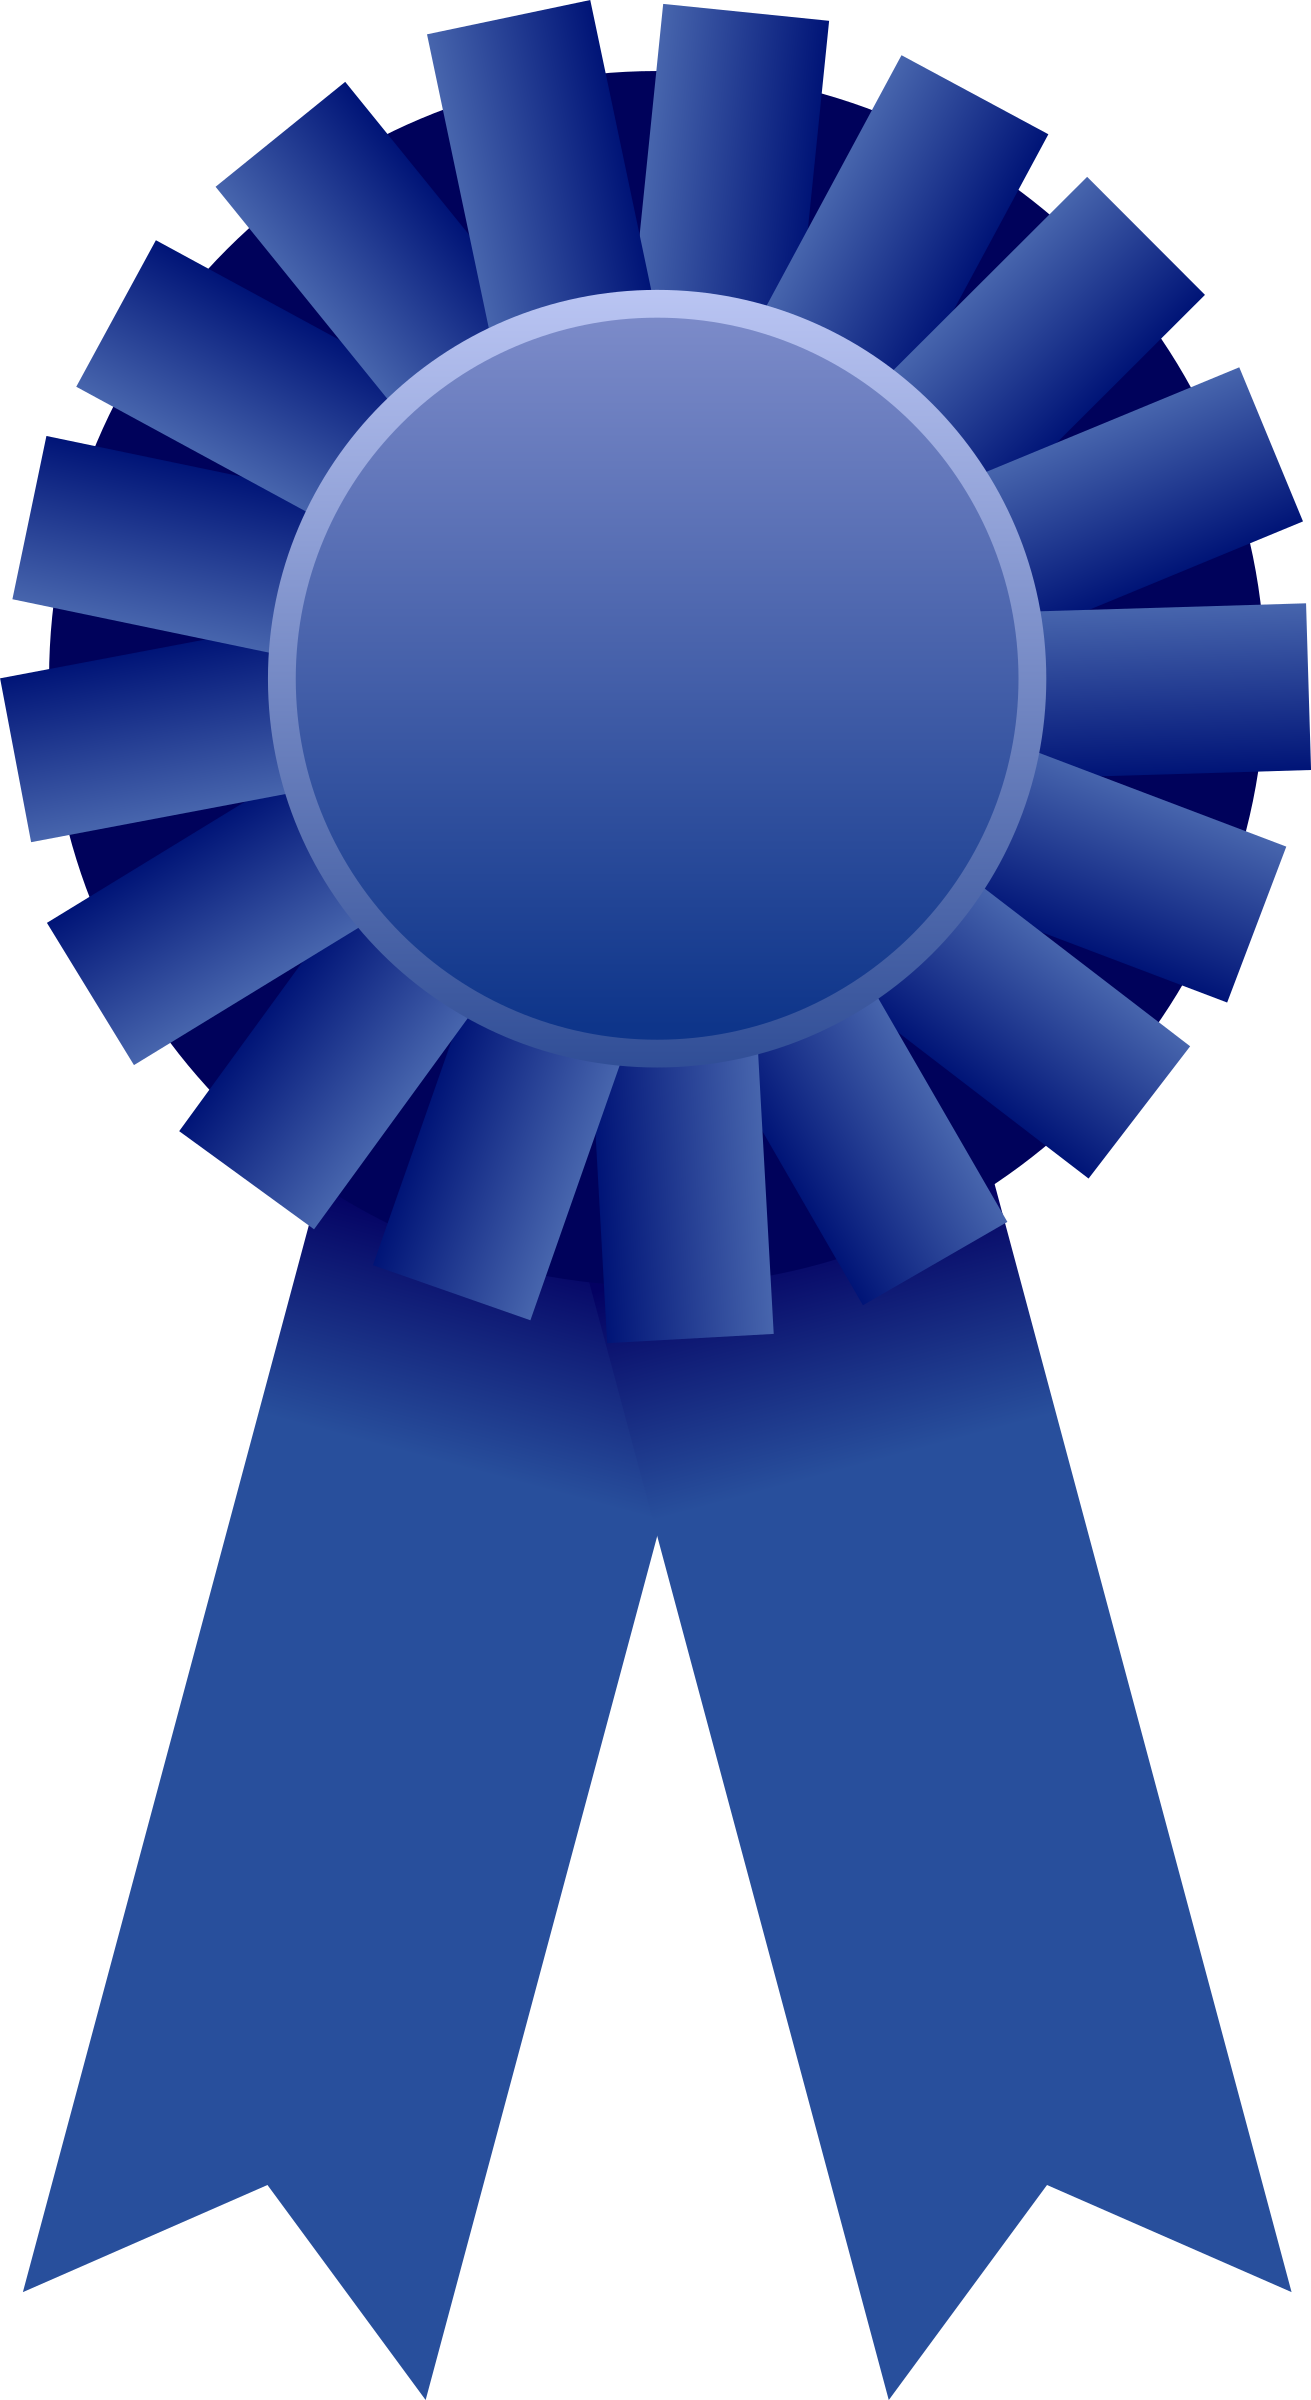 Award ribbon png station. Dictionary clipart blue